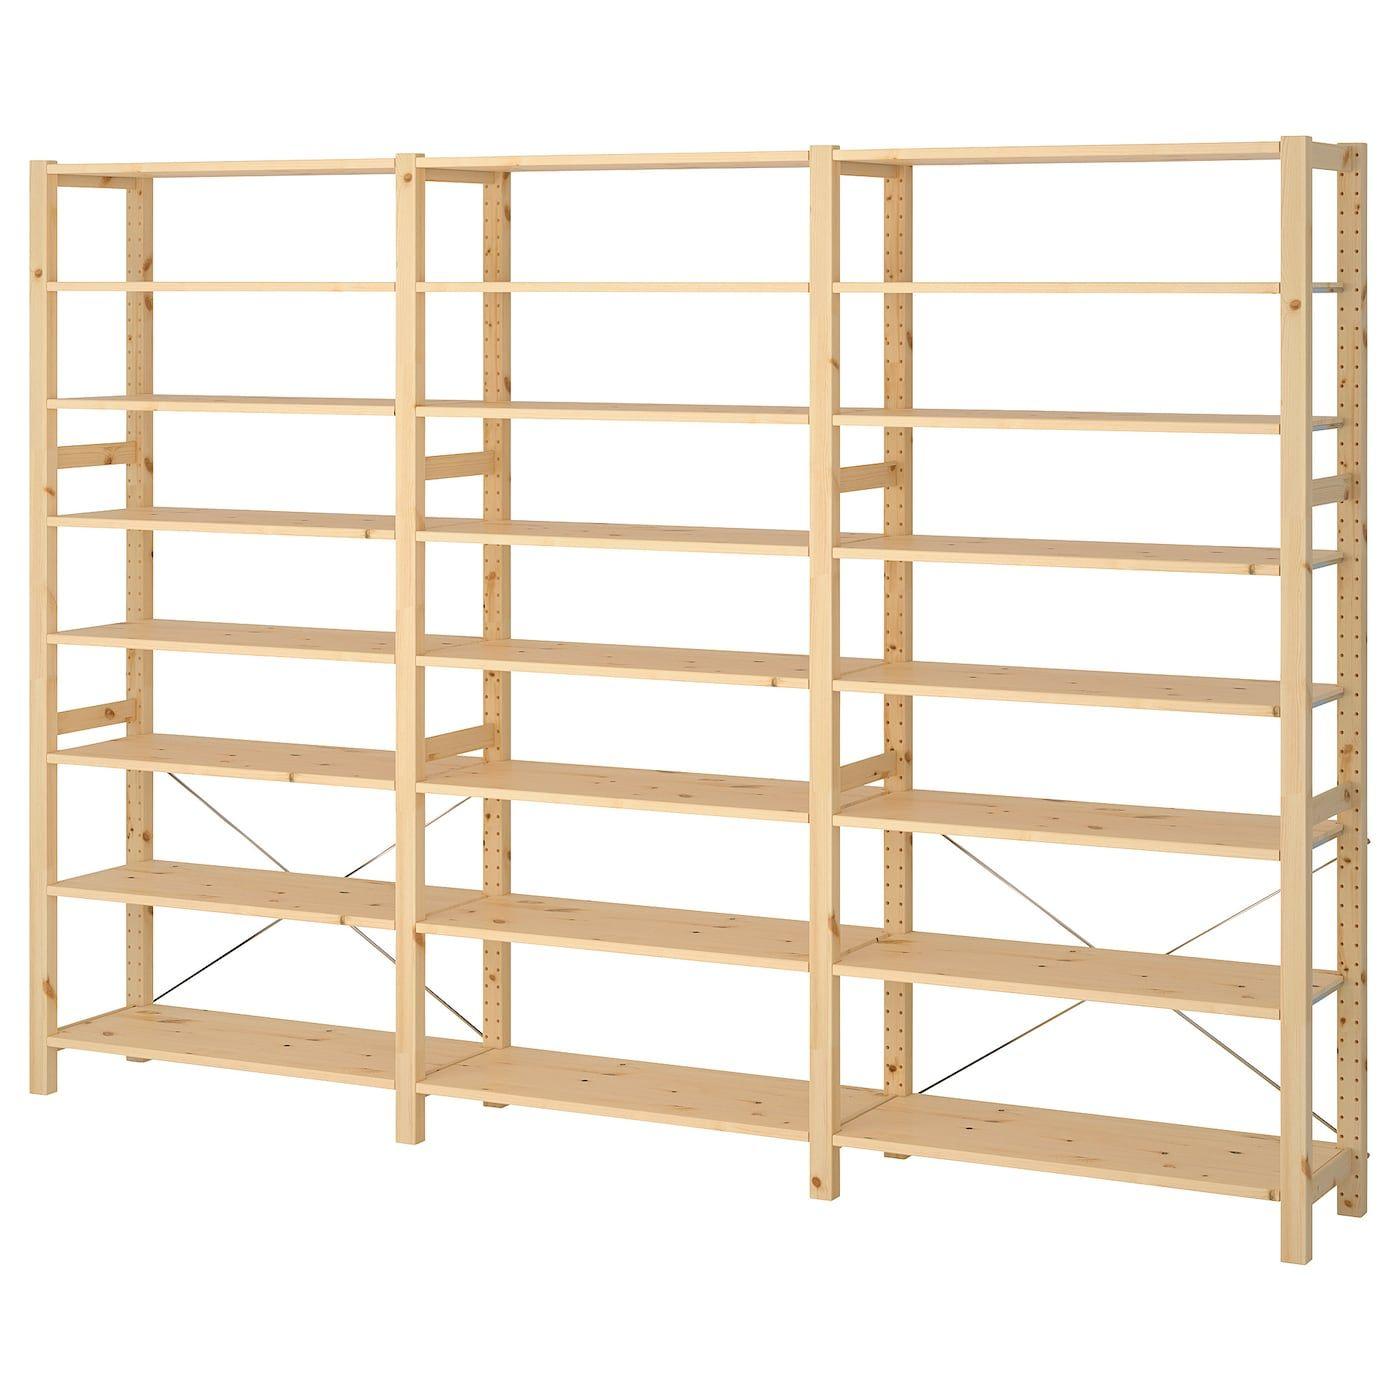 Ikea Ivar Pine 3 Section Shelving Unit In 2020 Shelves Ikea Wall Shelving Units